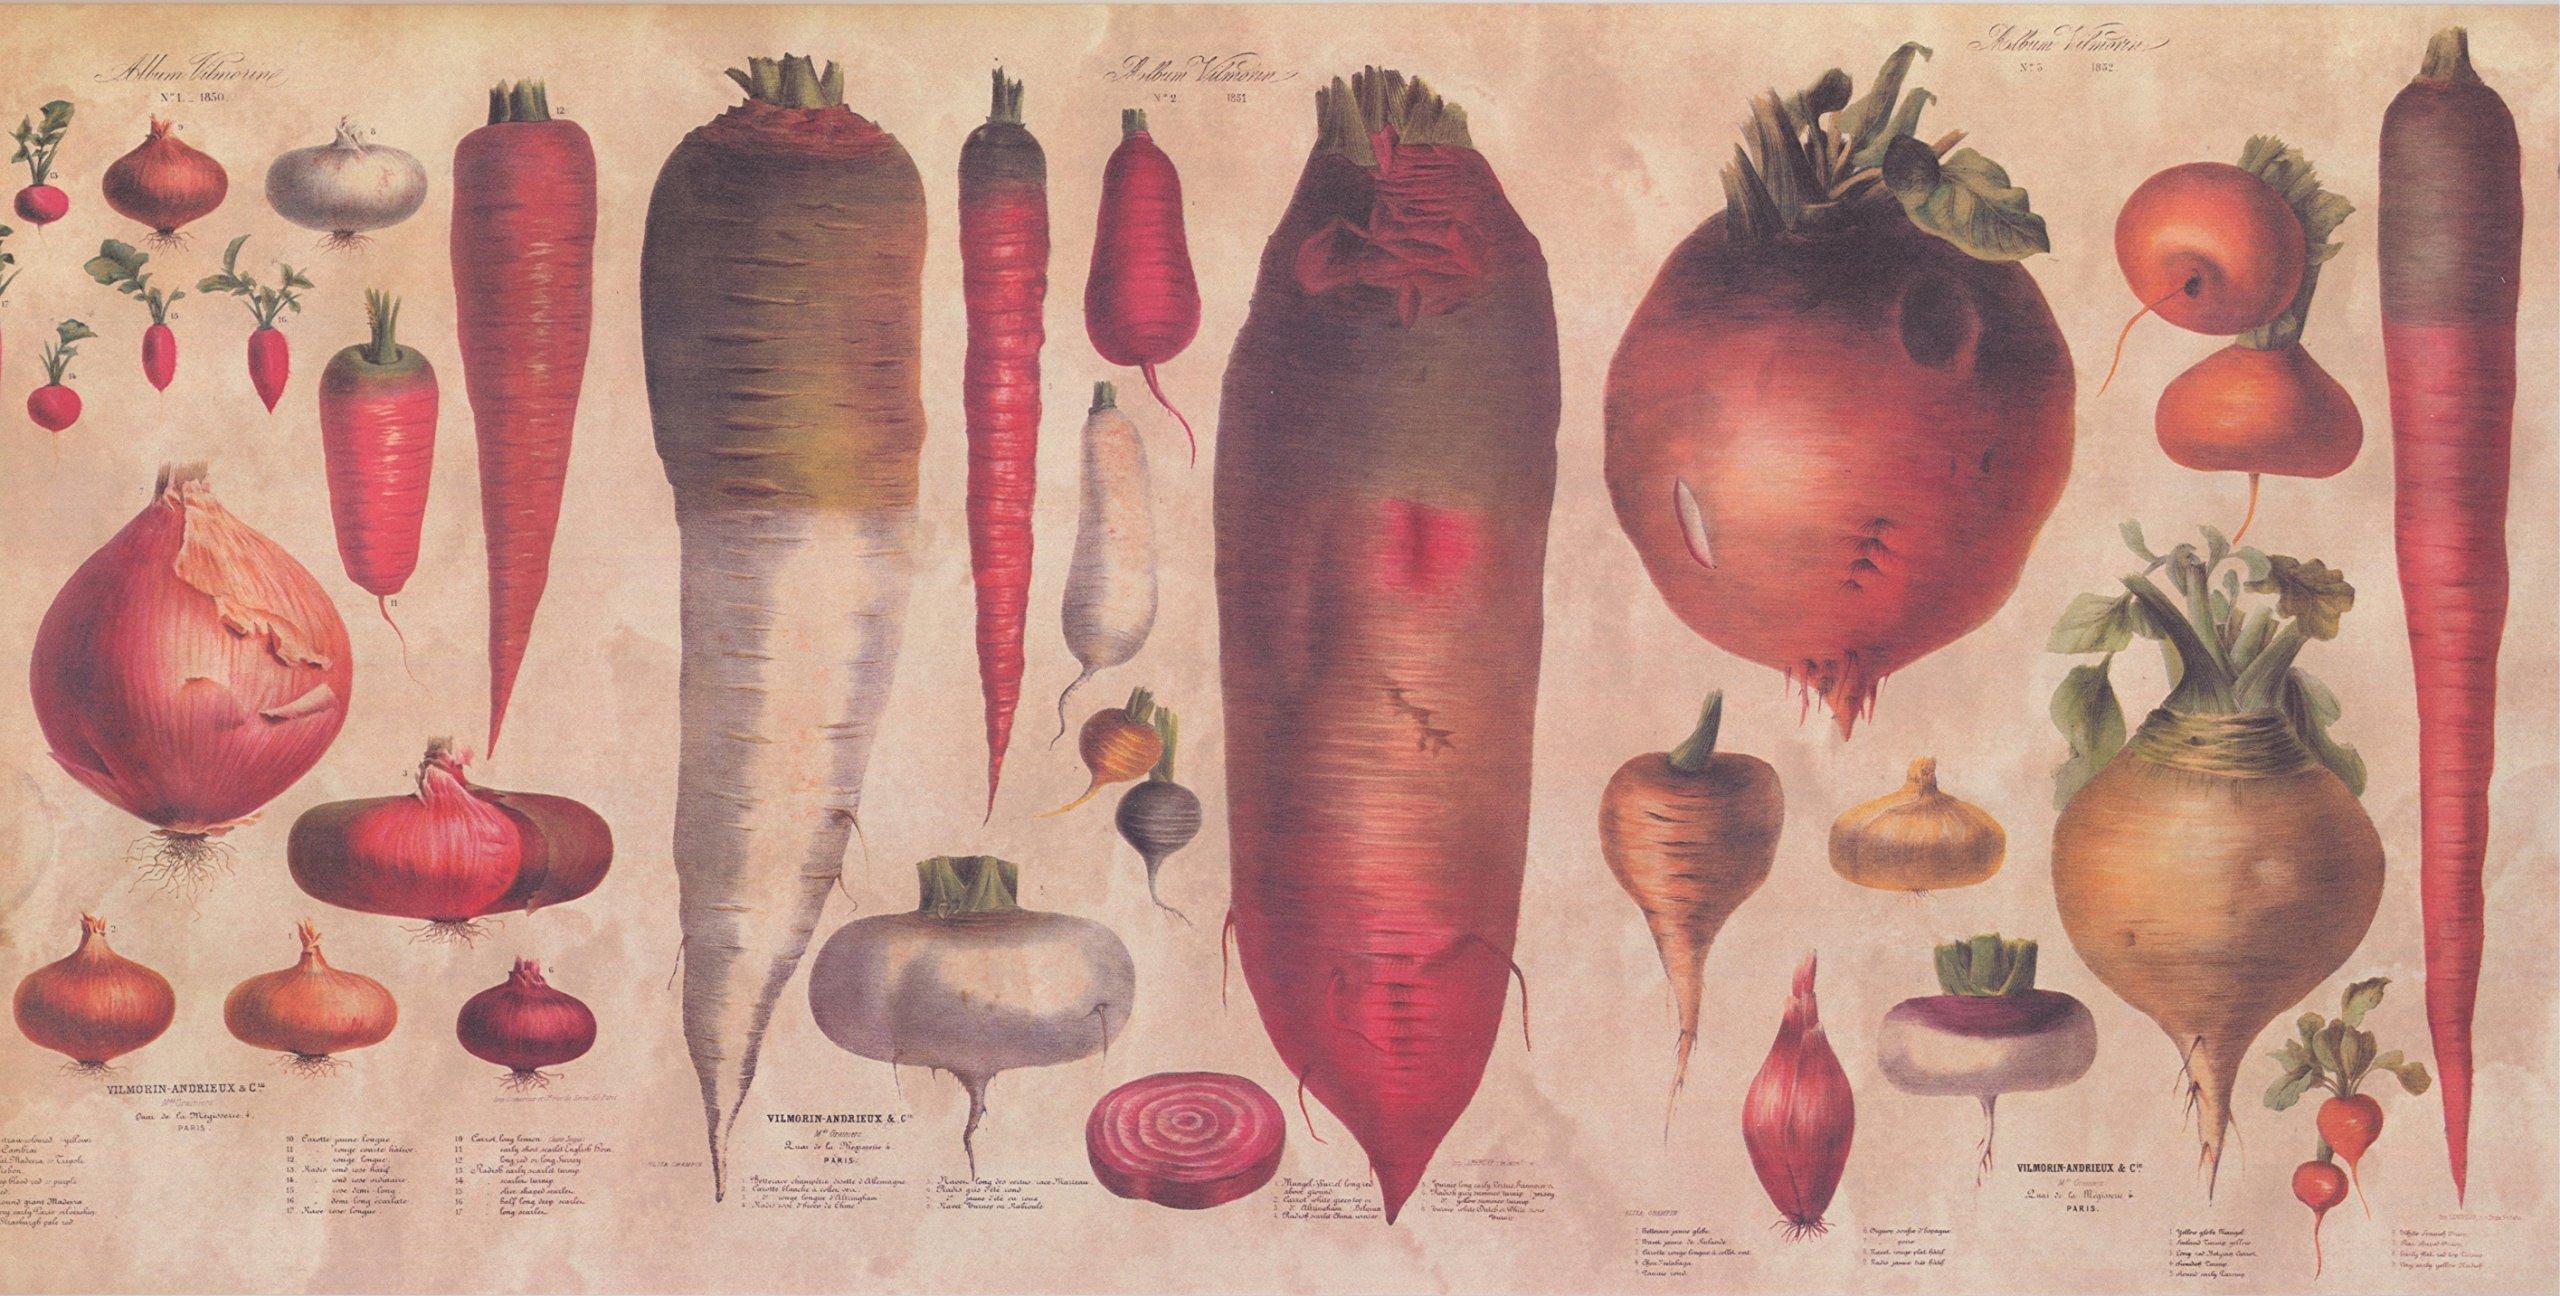 Wallpaper Border - Vegetables Wallpaper Border 30494 CB